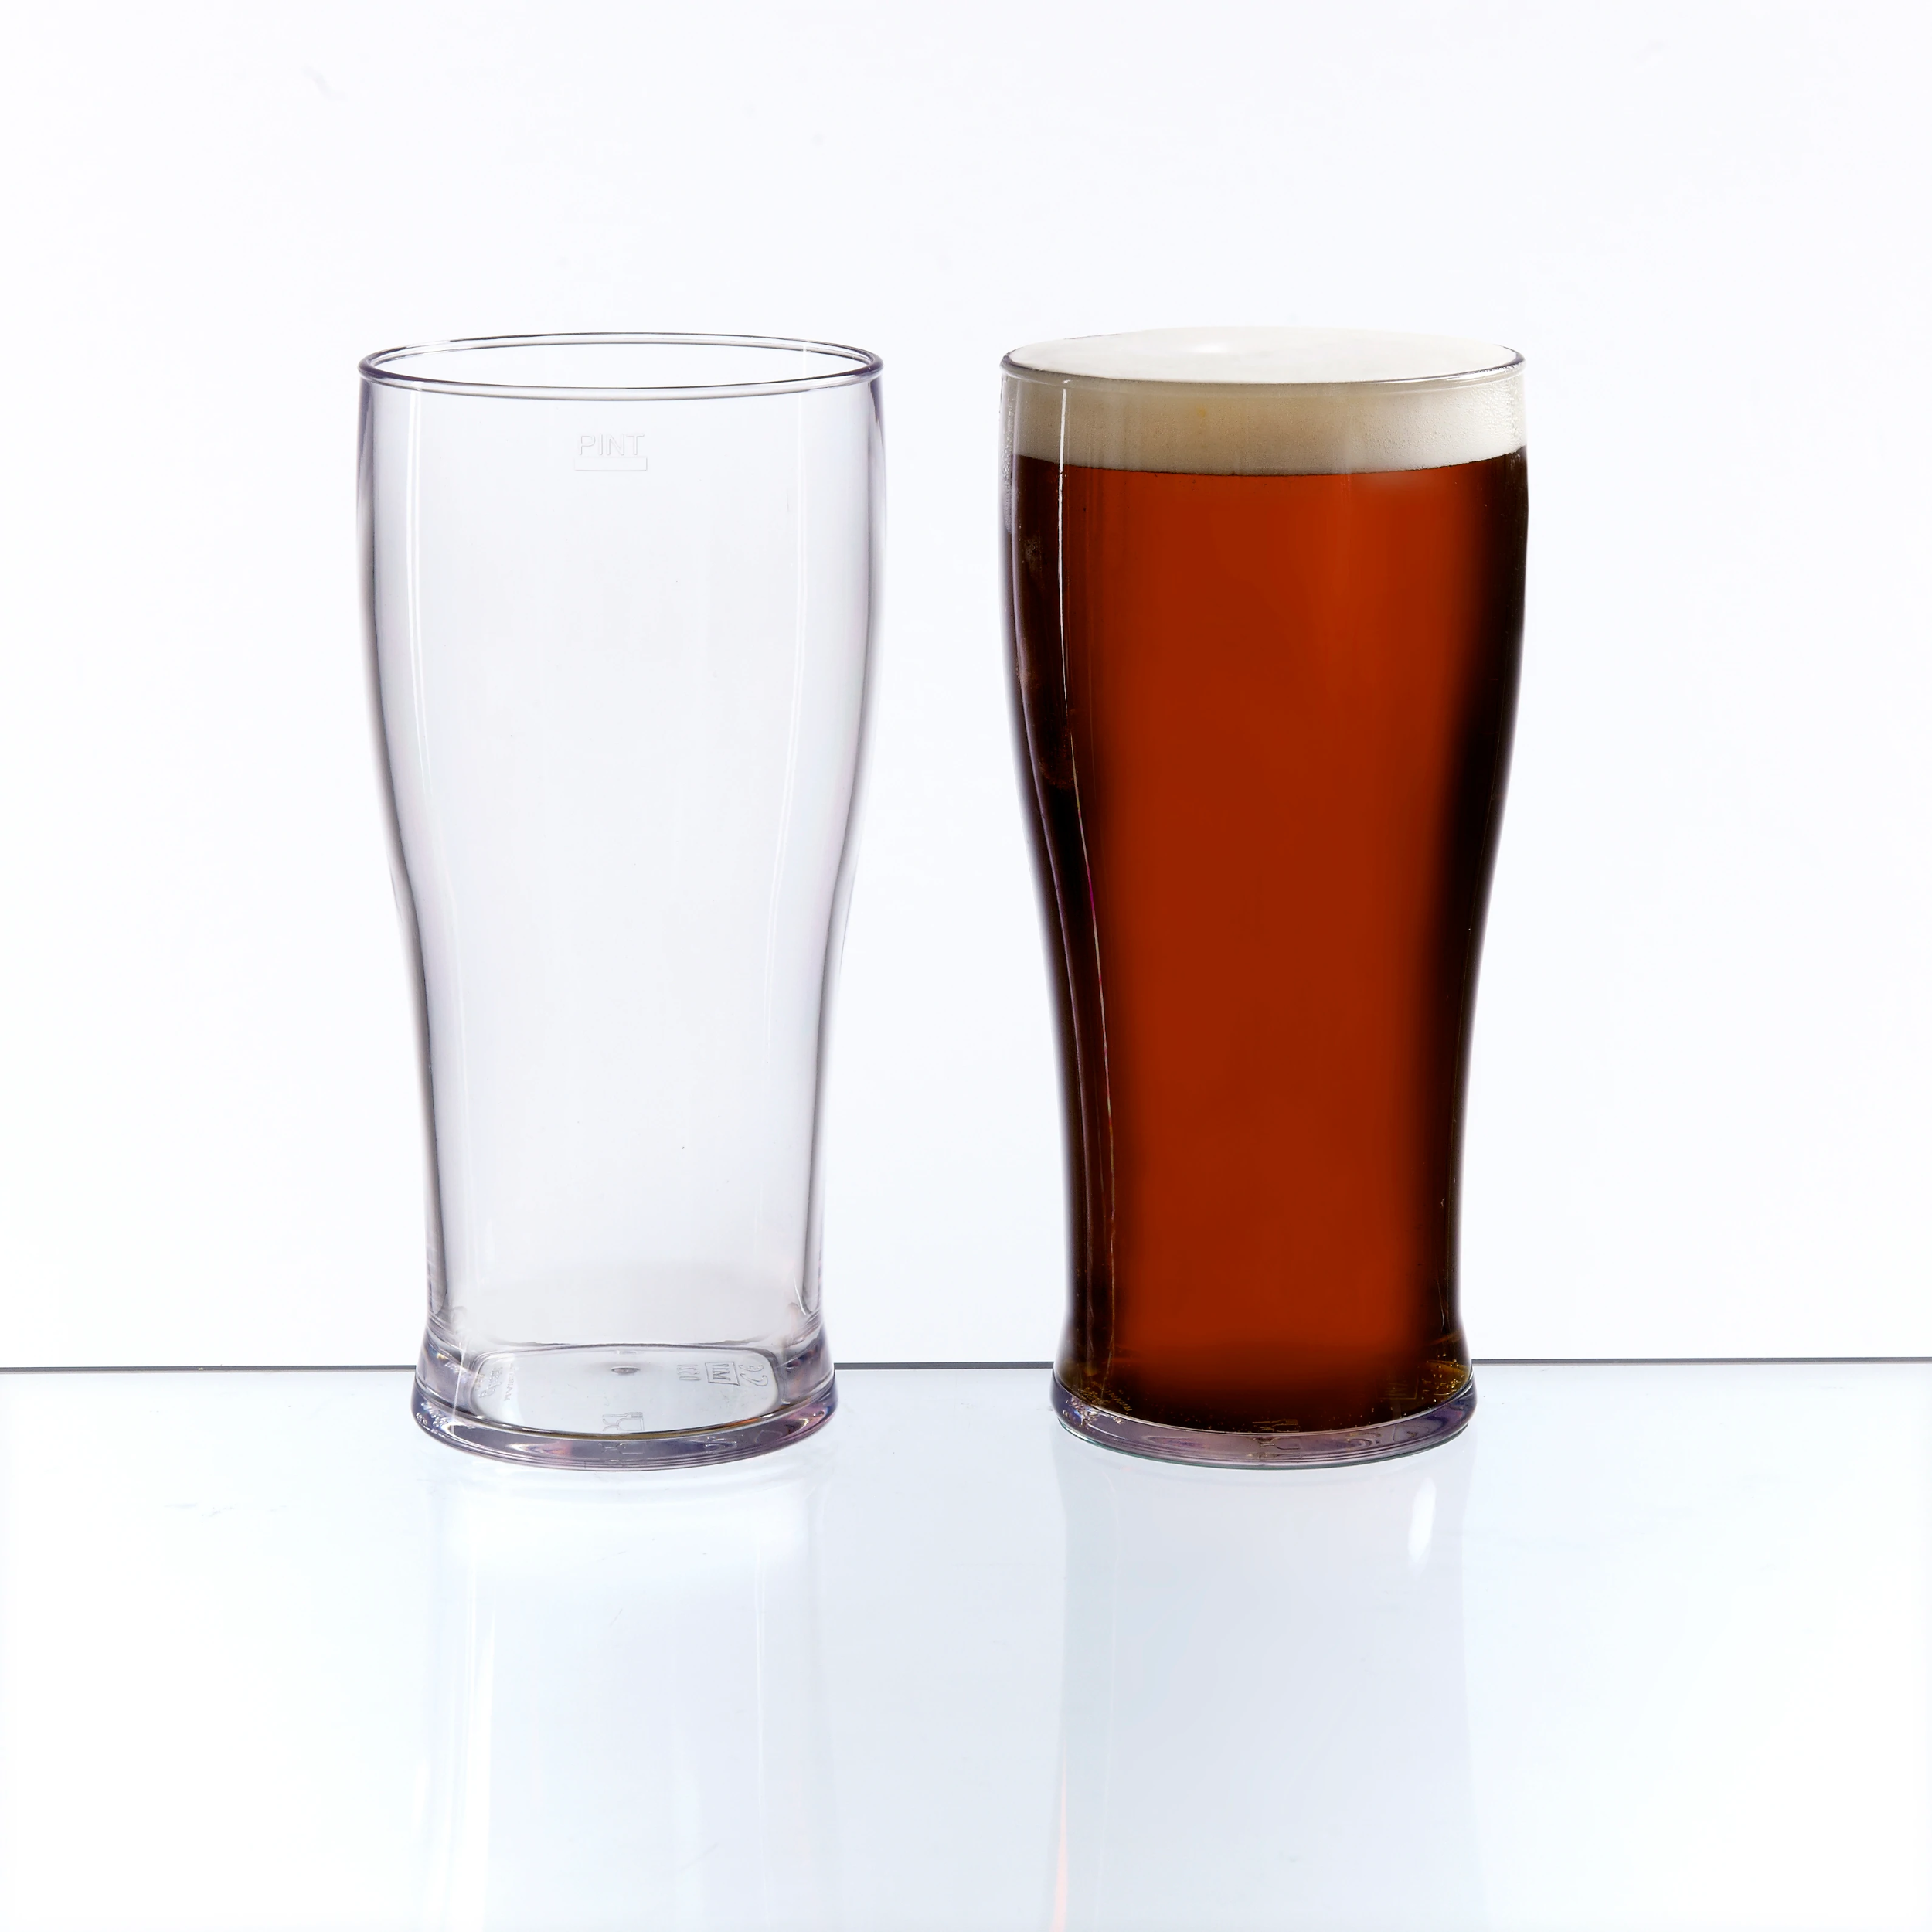 100 x Plastic Pint Glasses 20oz CE Marked Washable Reusable Nonic Glass